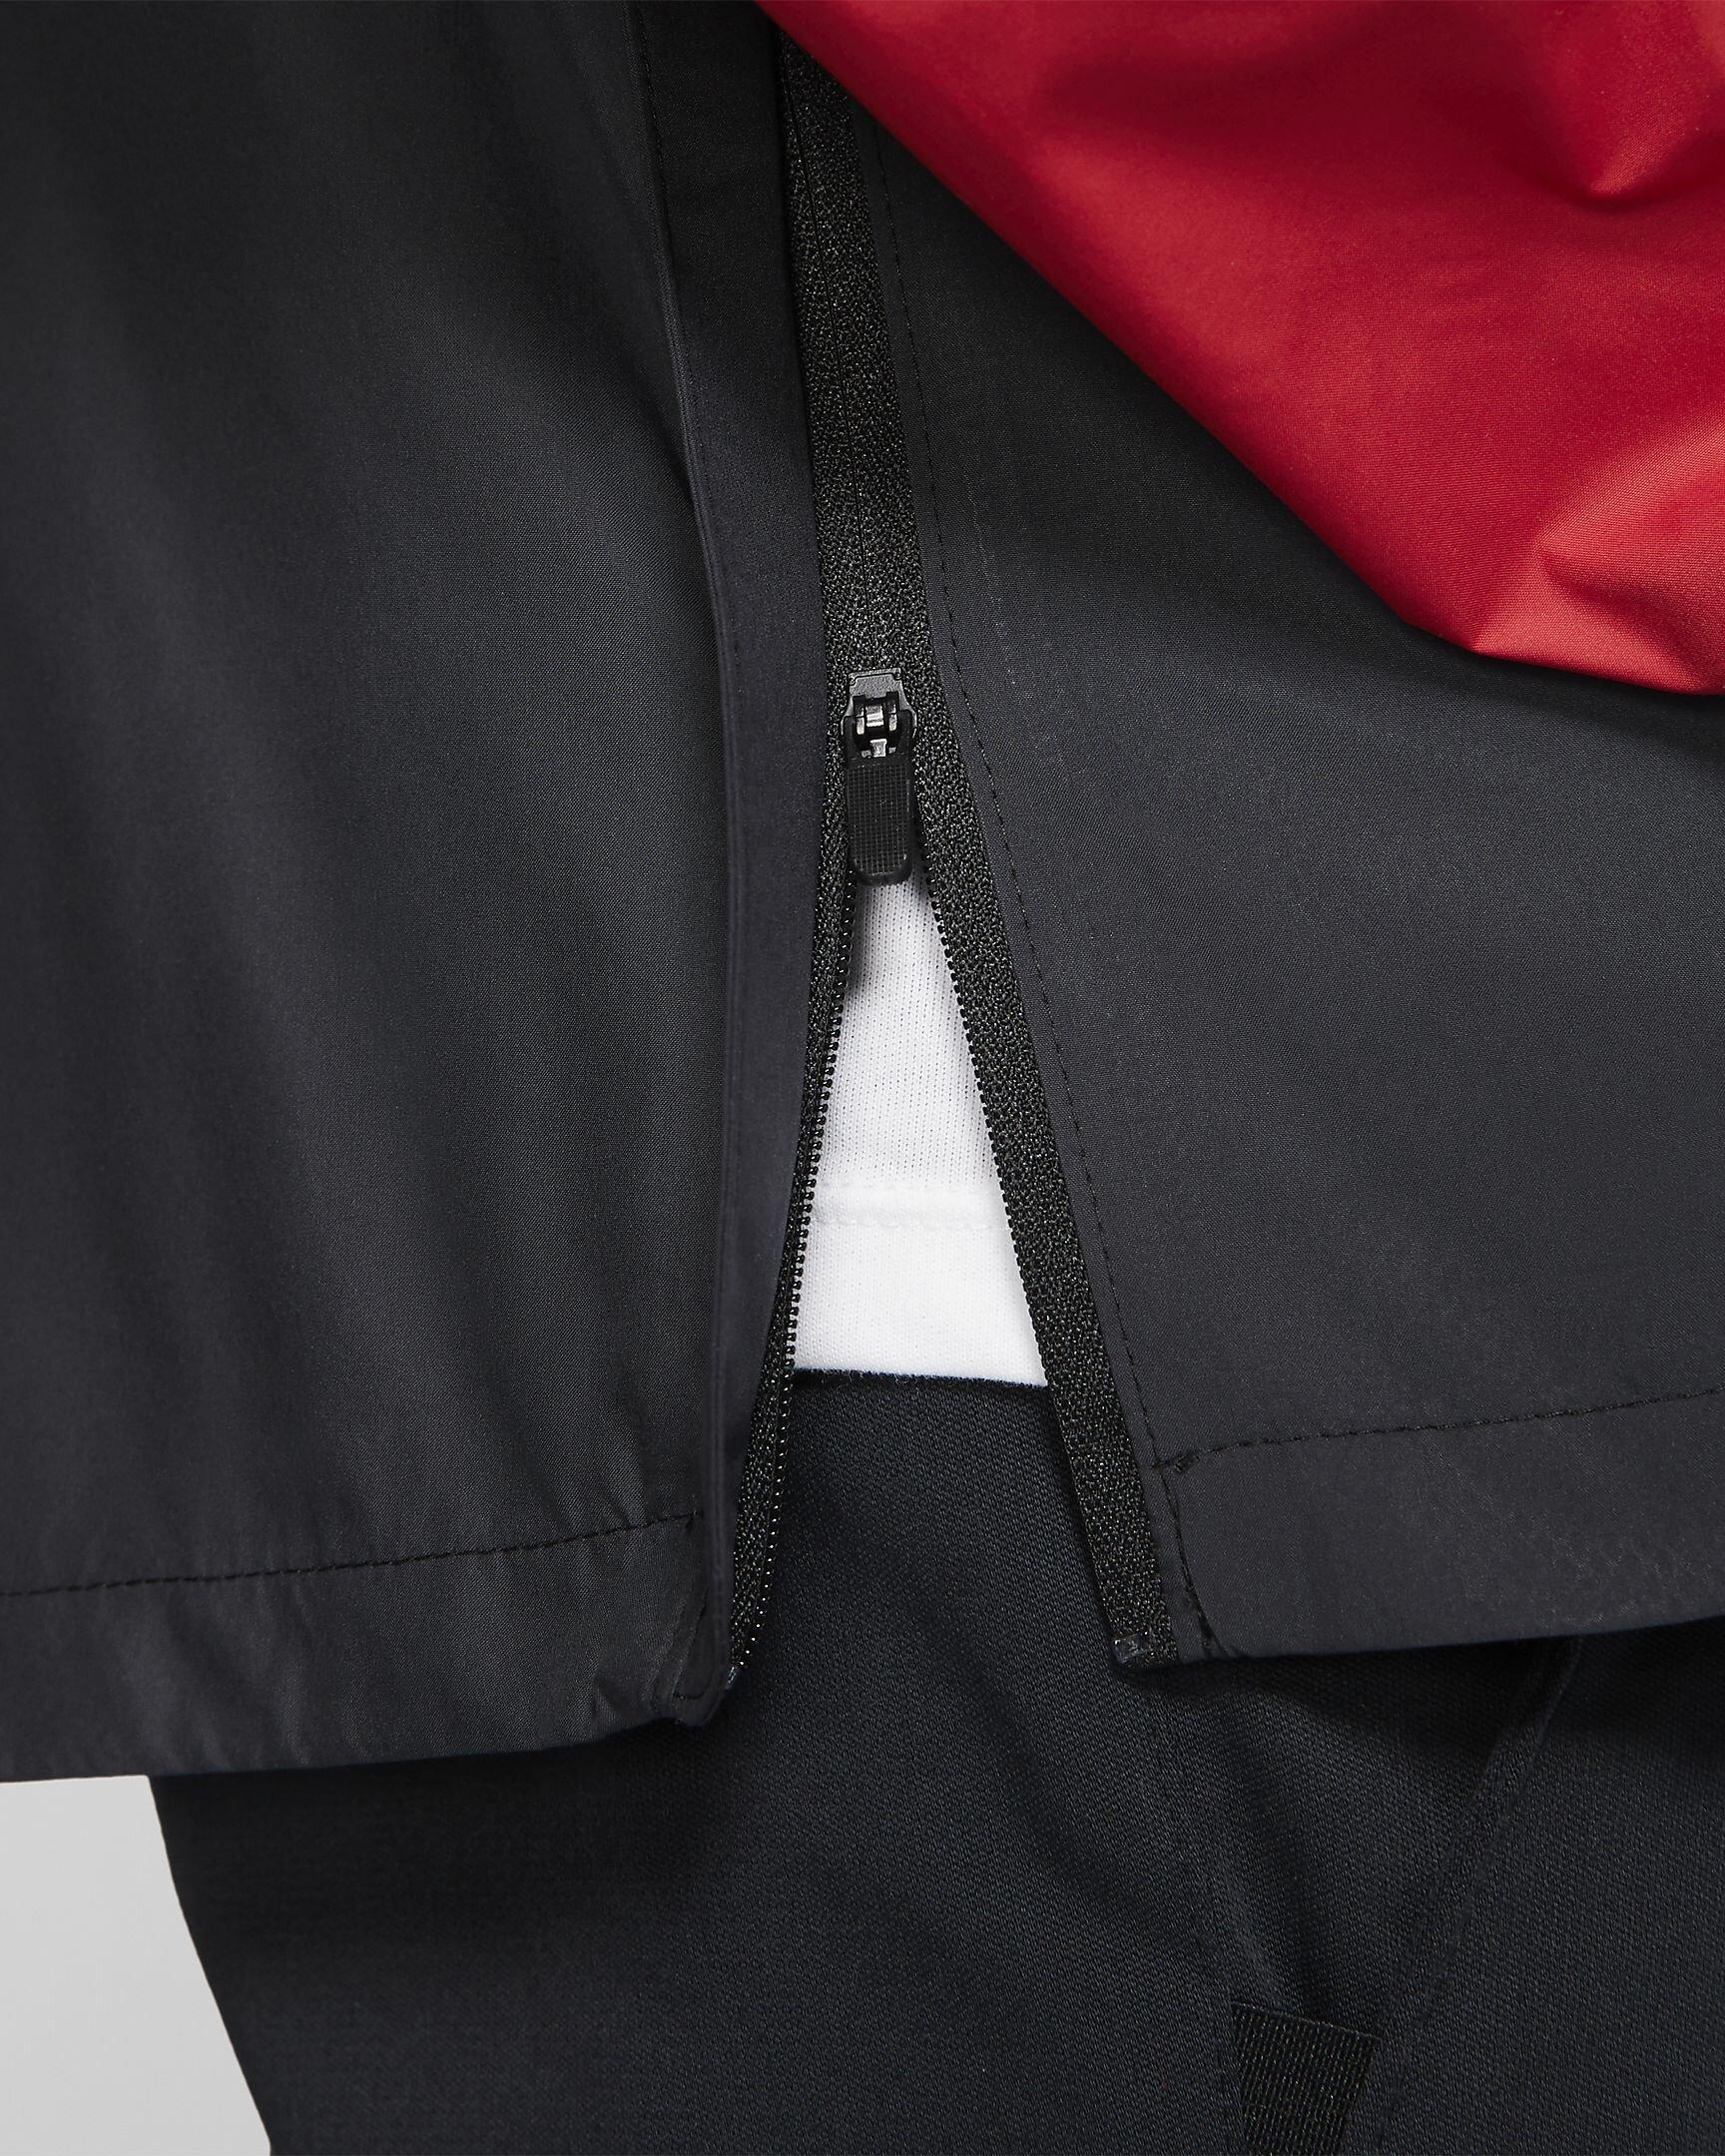 hurley-siege-anorak-mens-jacket-KVw8DS-5.jpg